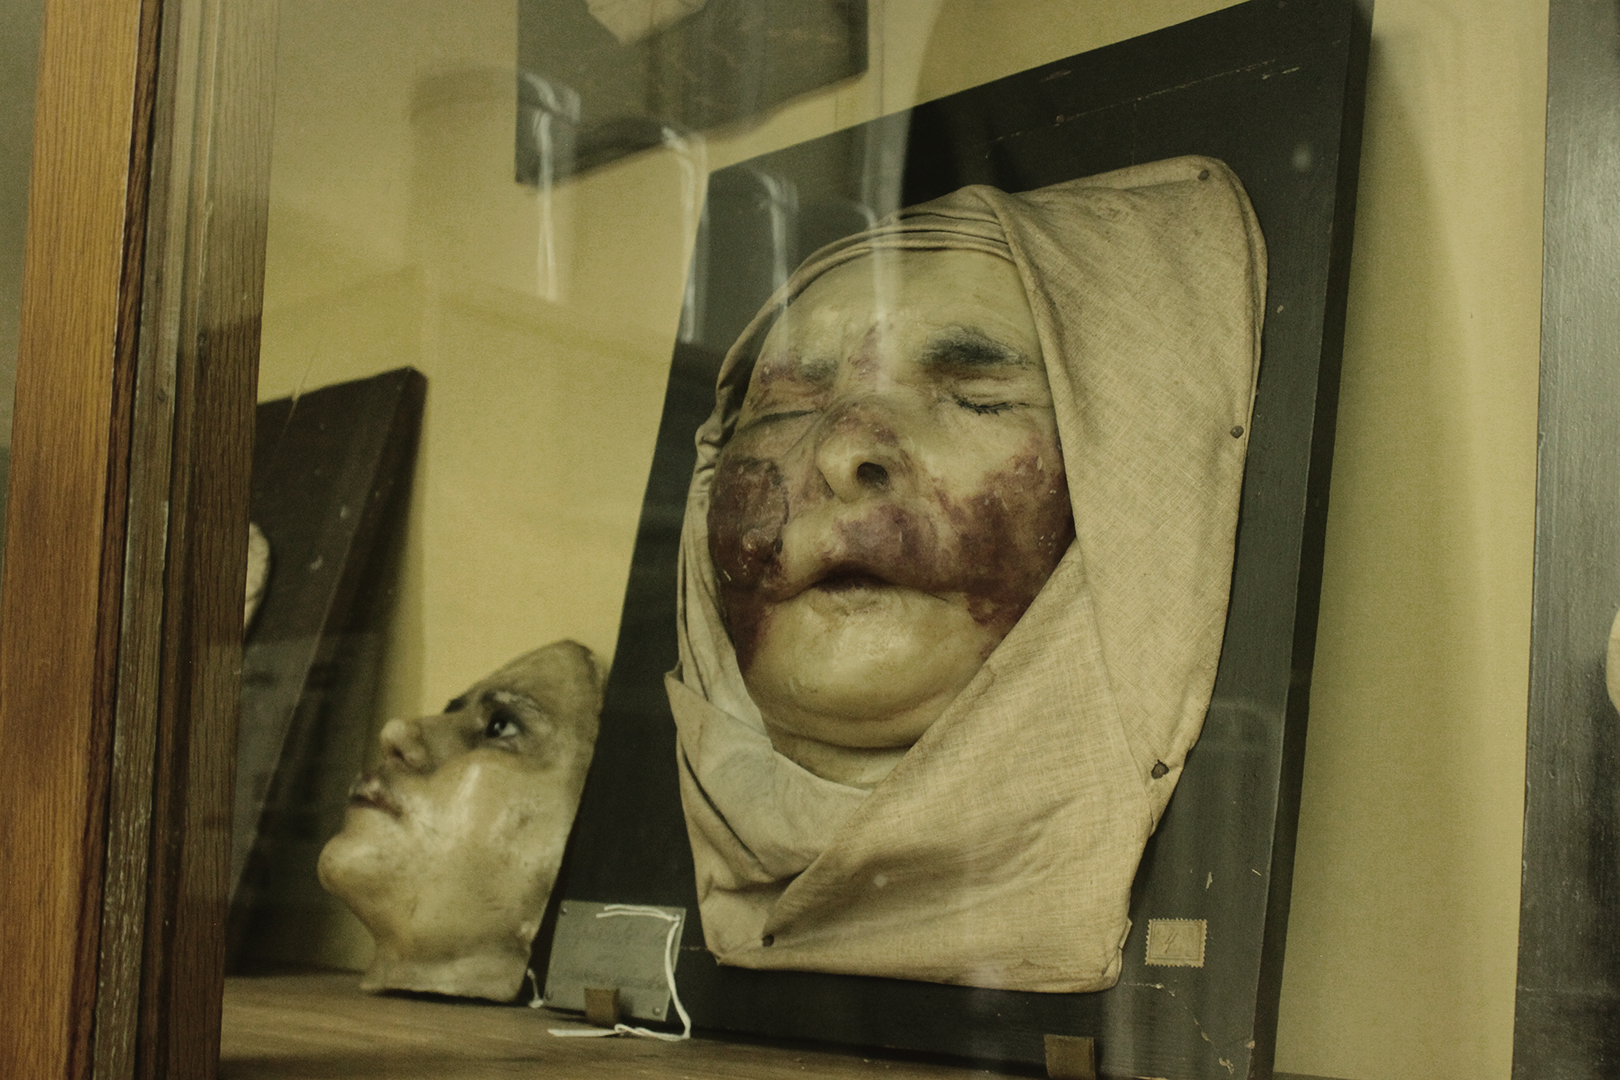 Wax model of lupus vulgaris lesions, Museum of Portuguese Dermatology (Museu da Dermatologia Portuguesa).